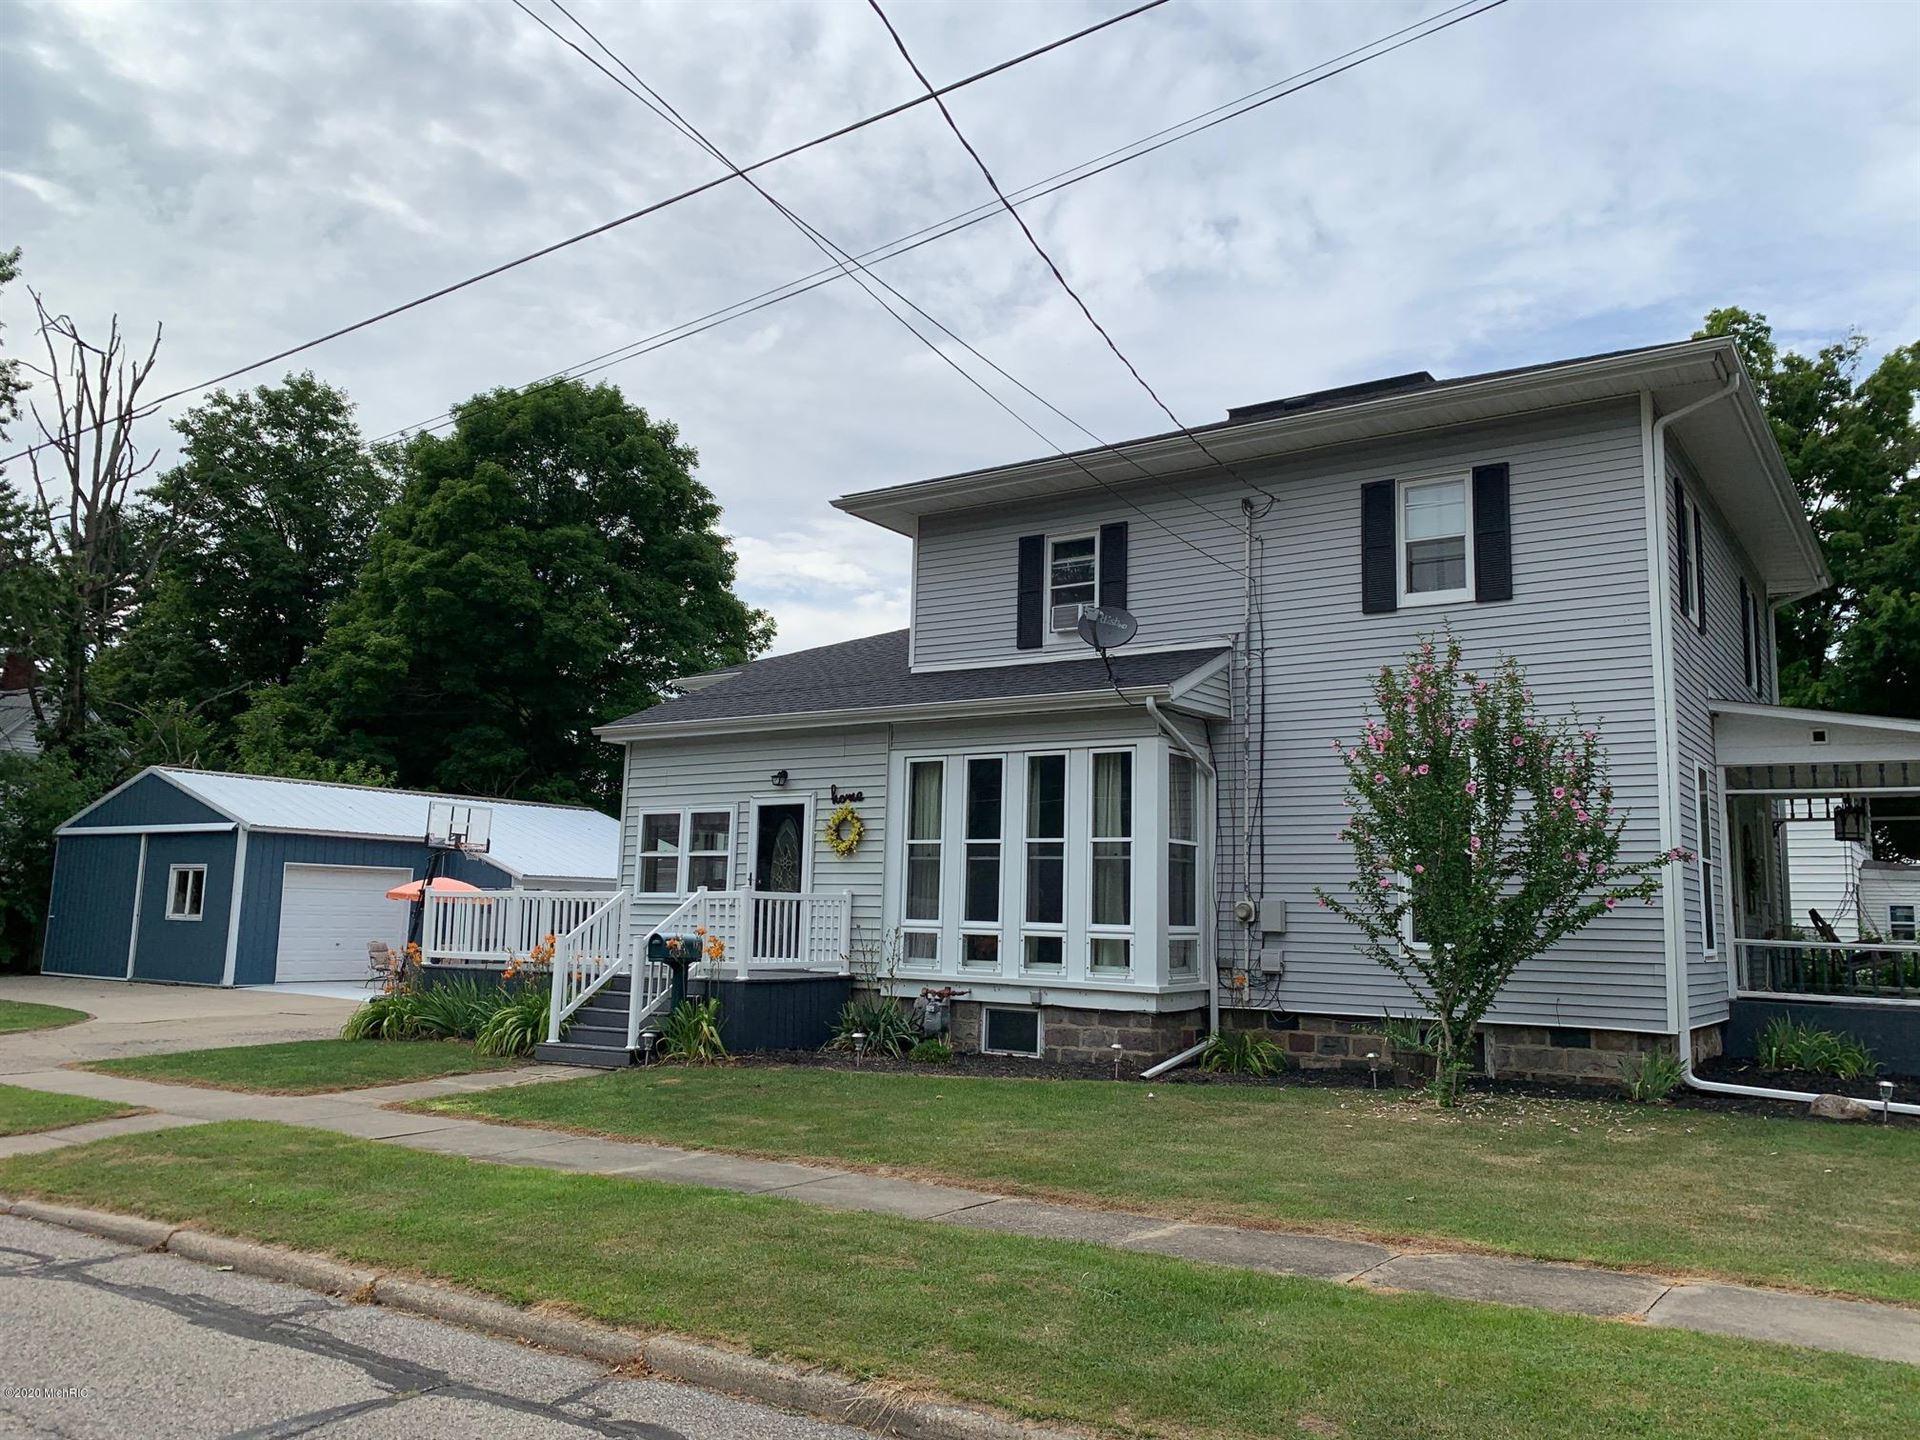 213 N Hudson, Coldwater, MI 49036 - MLS#: 20031067